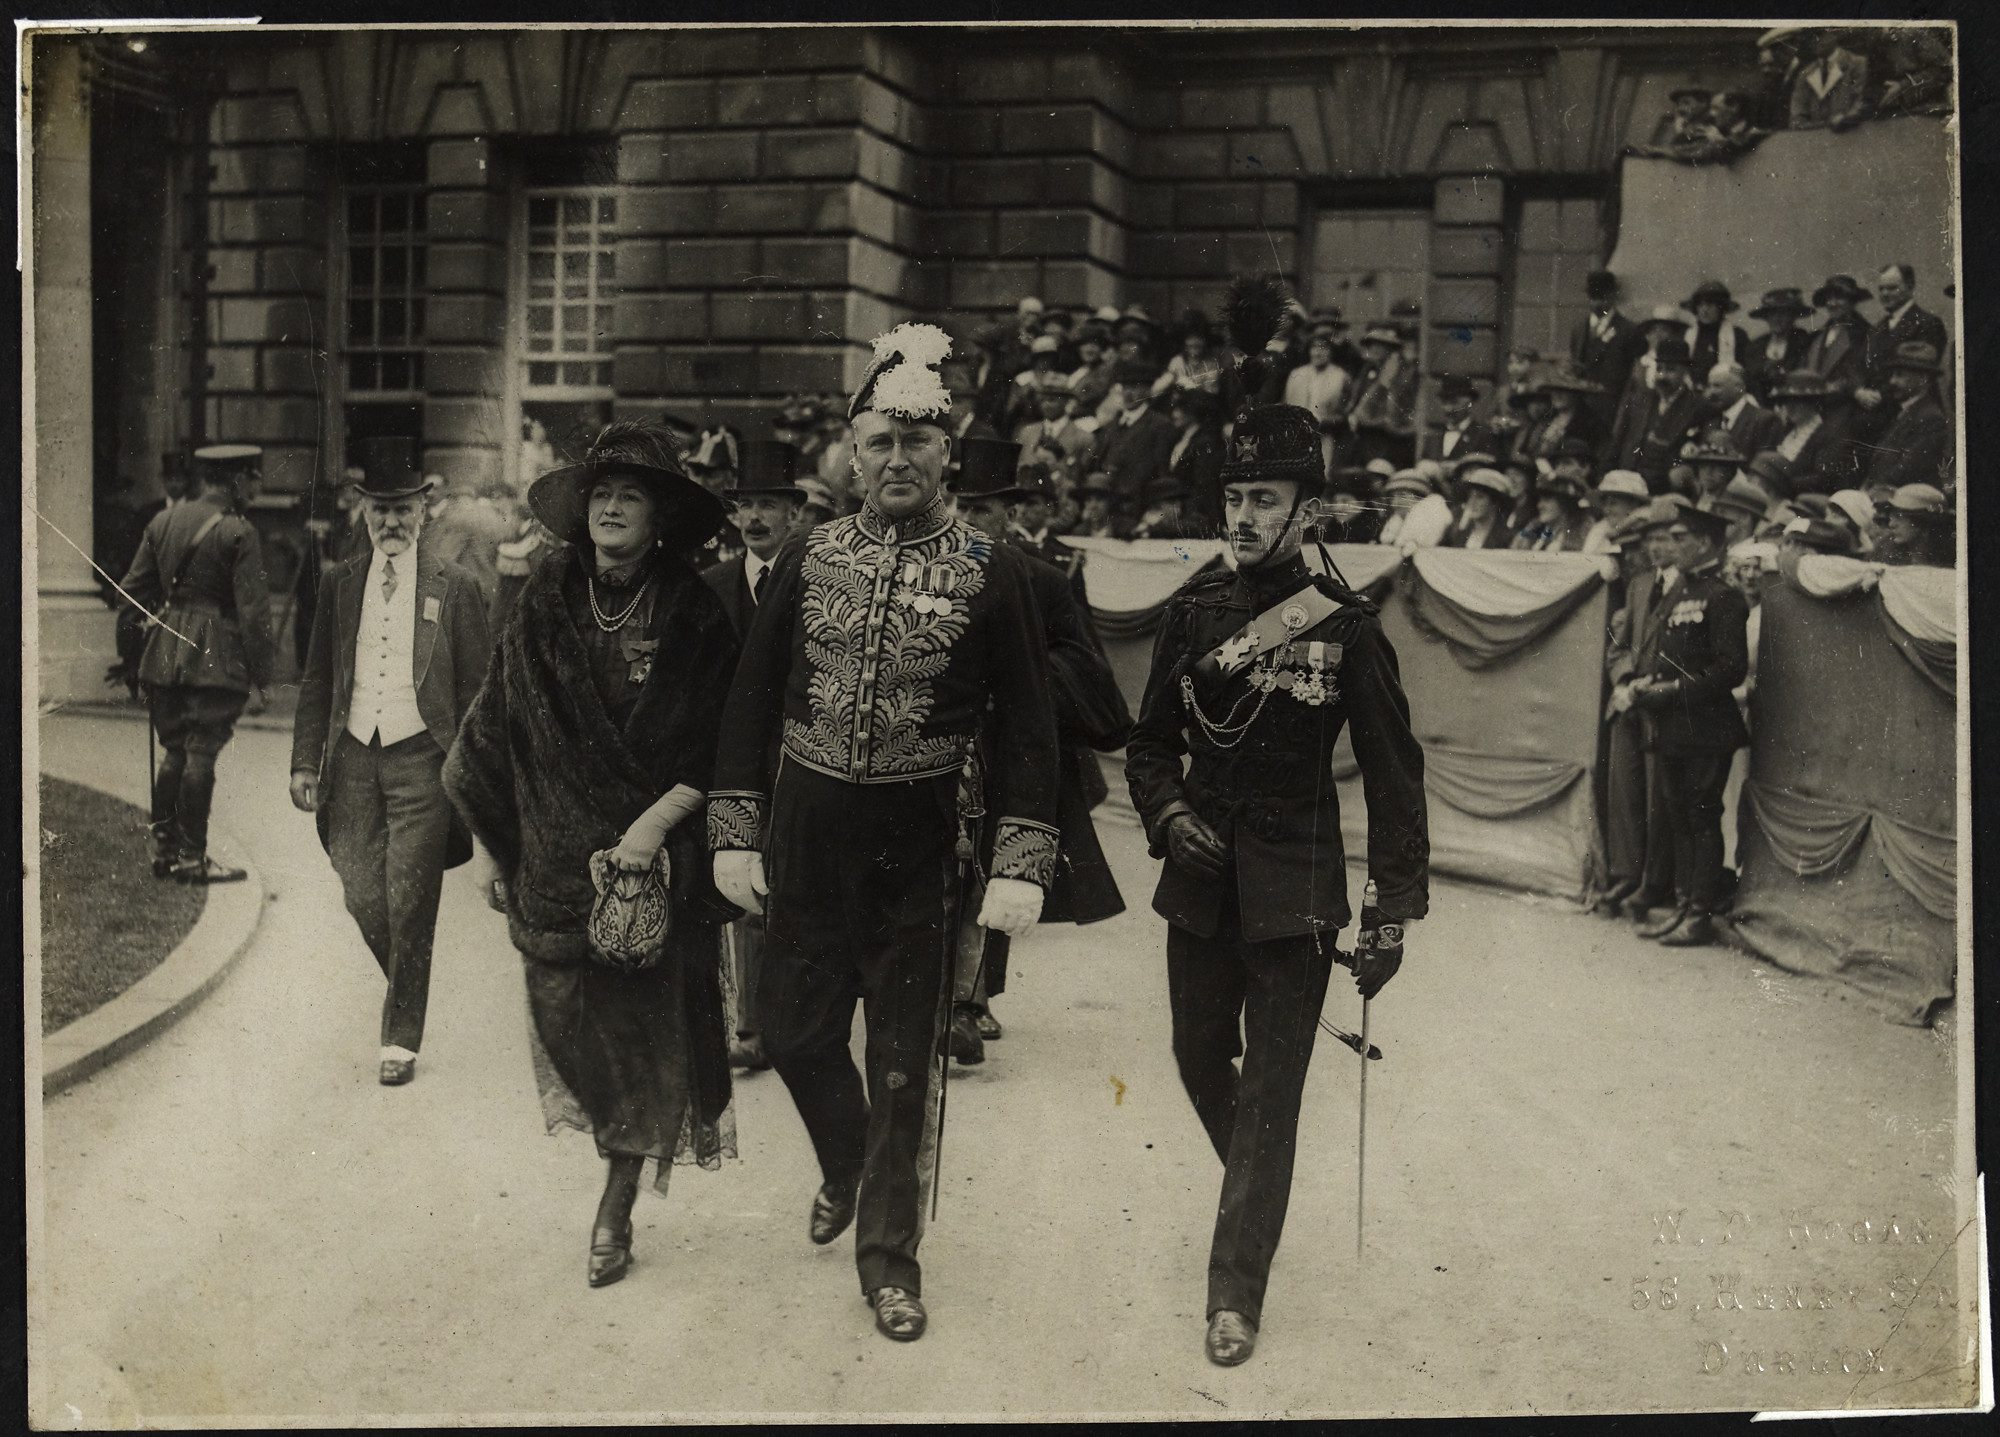 Sir Hamar Greenwood, Chief Secretary for Ireland, arriving at City Hall. NLI: HOGW 185